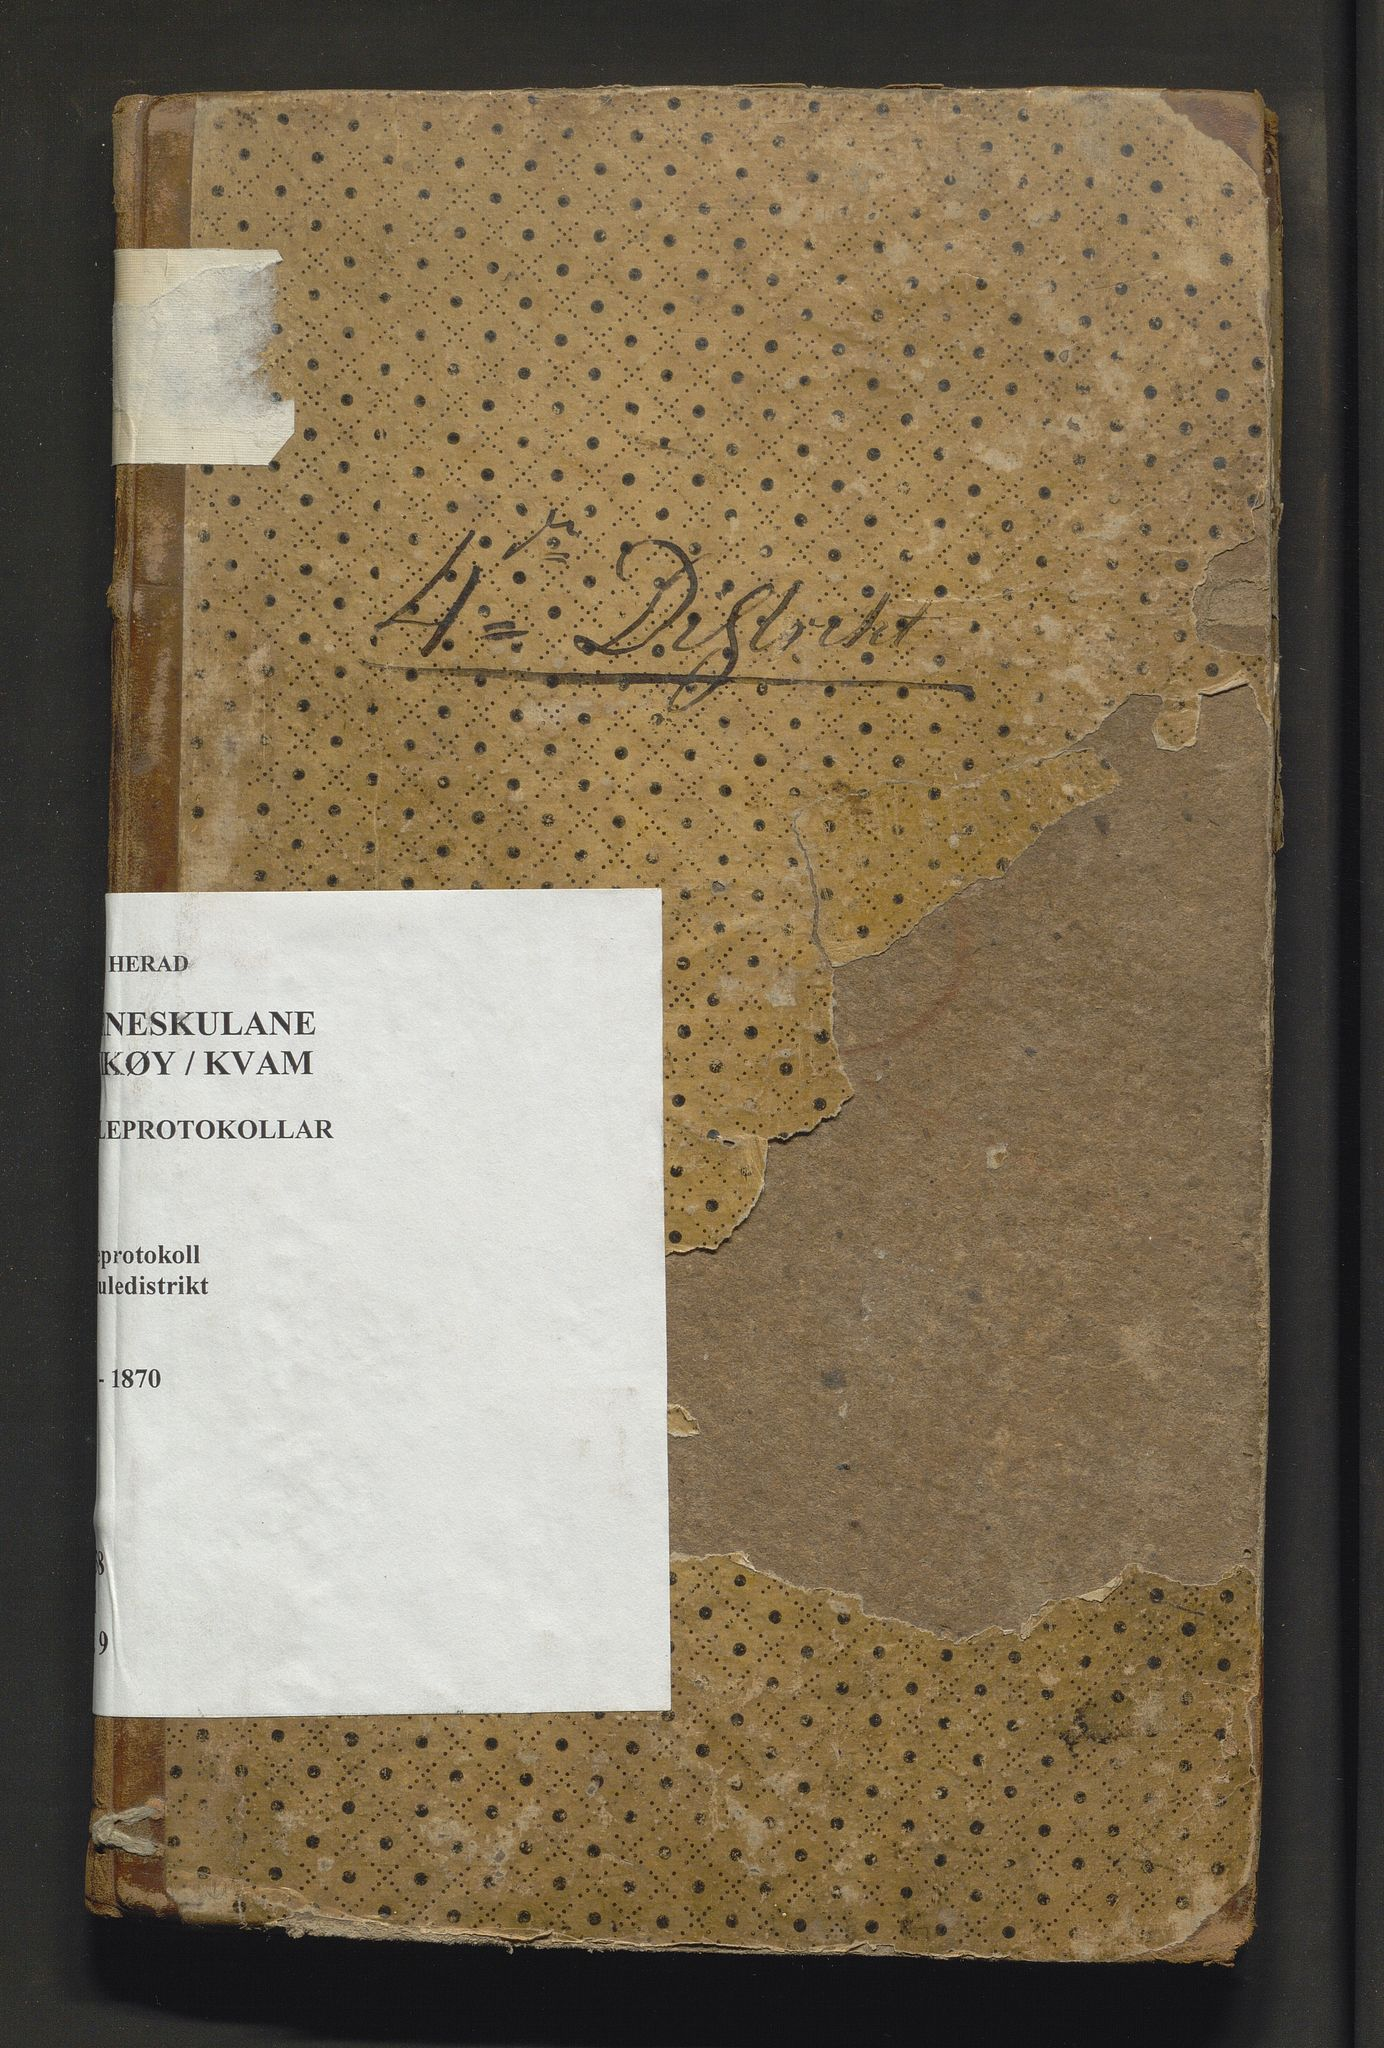 IKAH, Kvam herad. Barneskulane, F/Fa/L0009: Skuleprotokoll for skoleholderen i Vikøy prestegjeld 4. skuledistrikt, m/inventarliste, 1833-1870